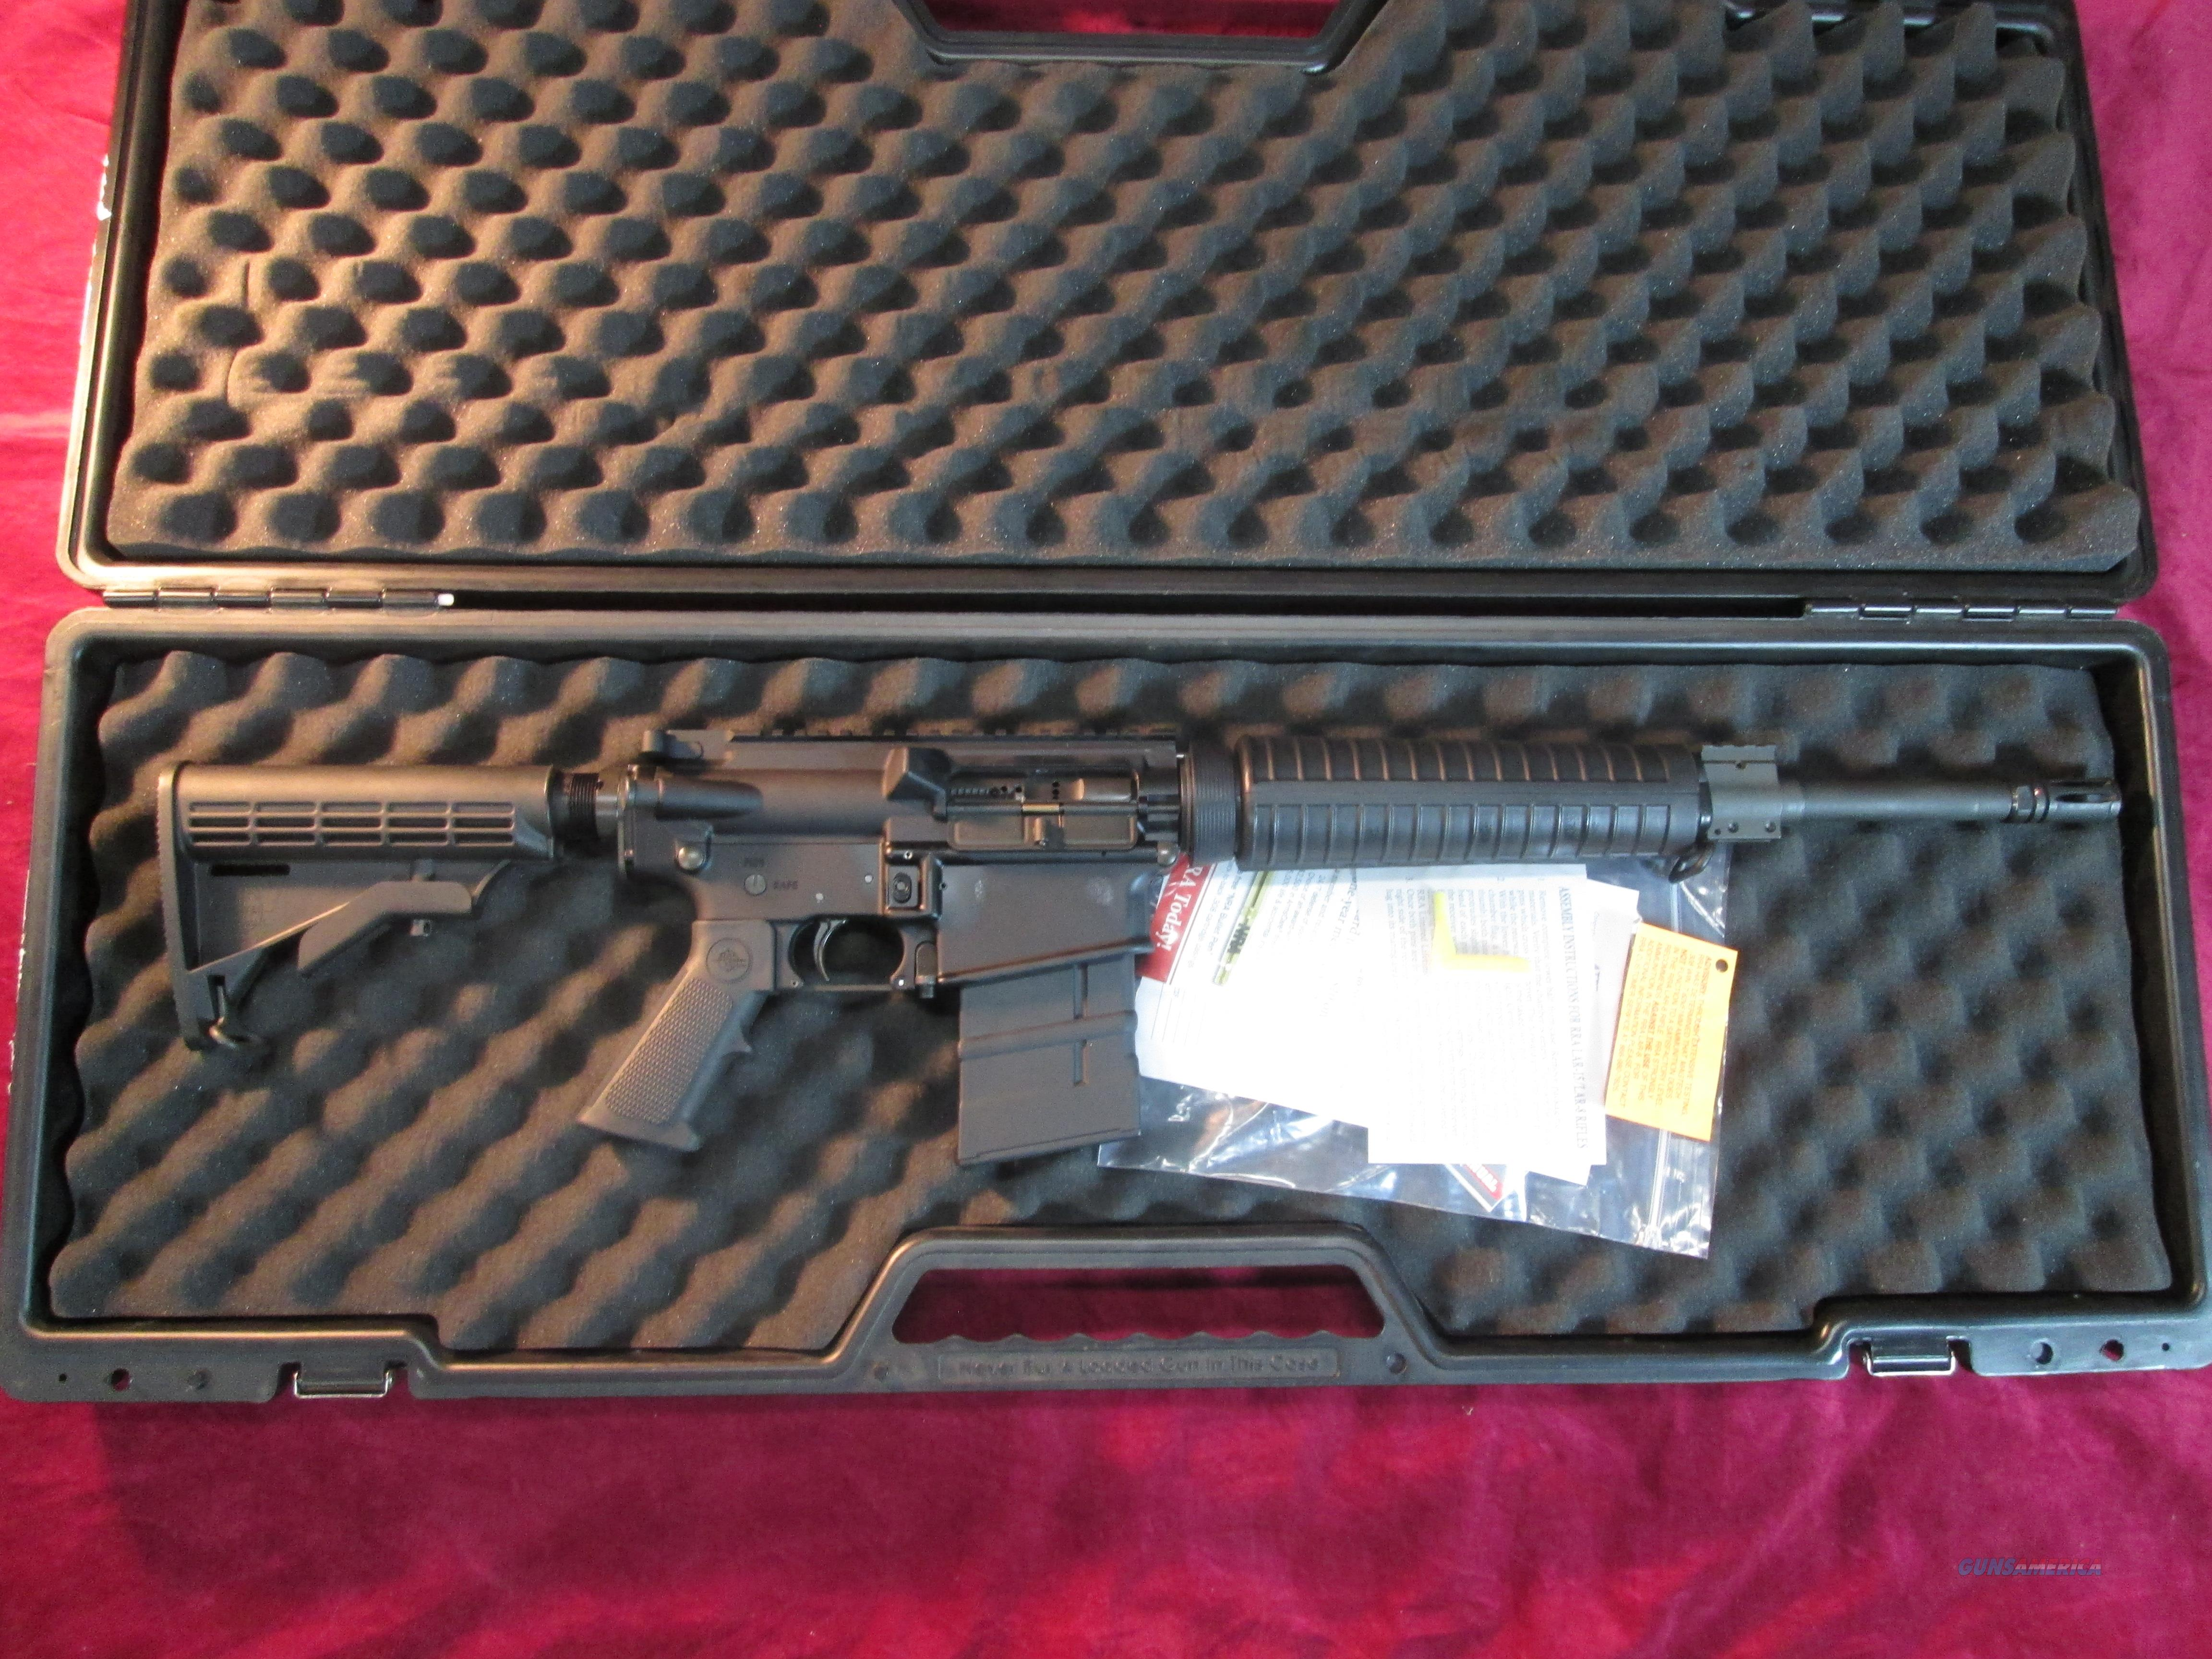 Rifle deals online